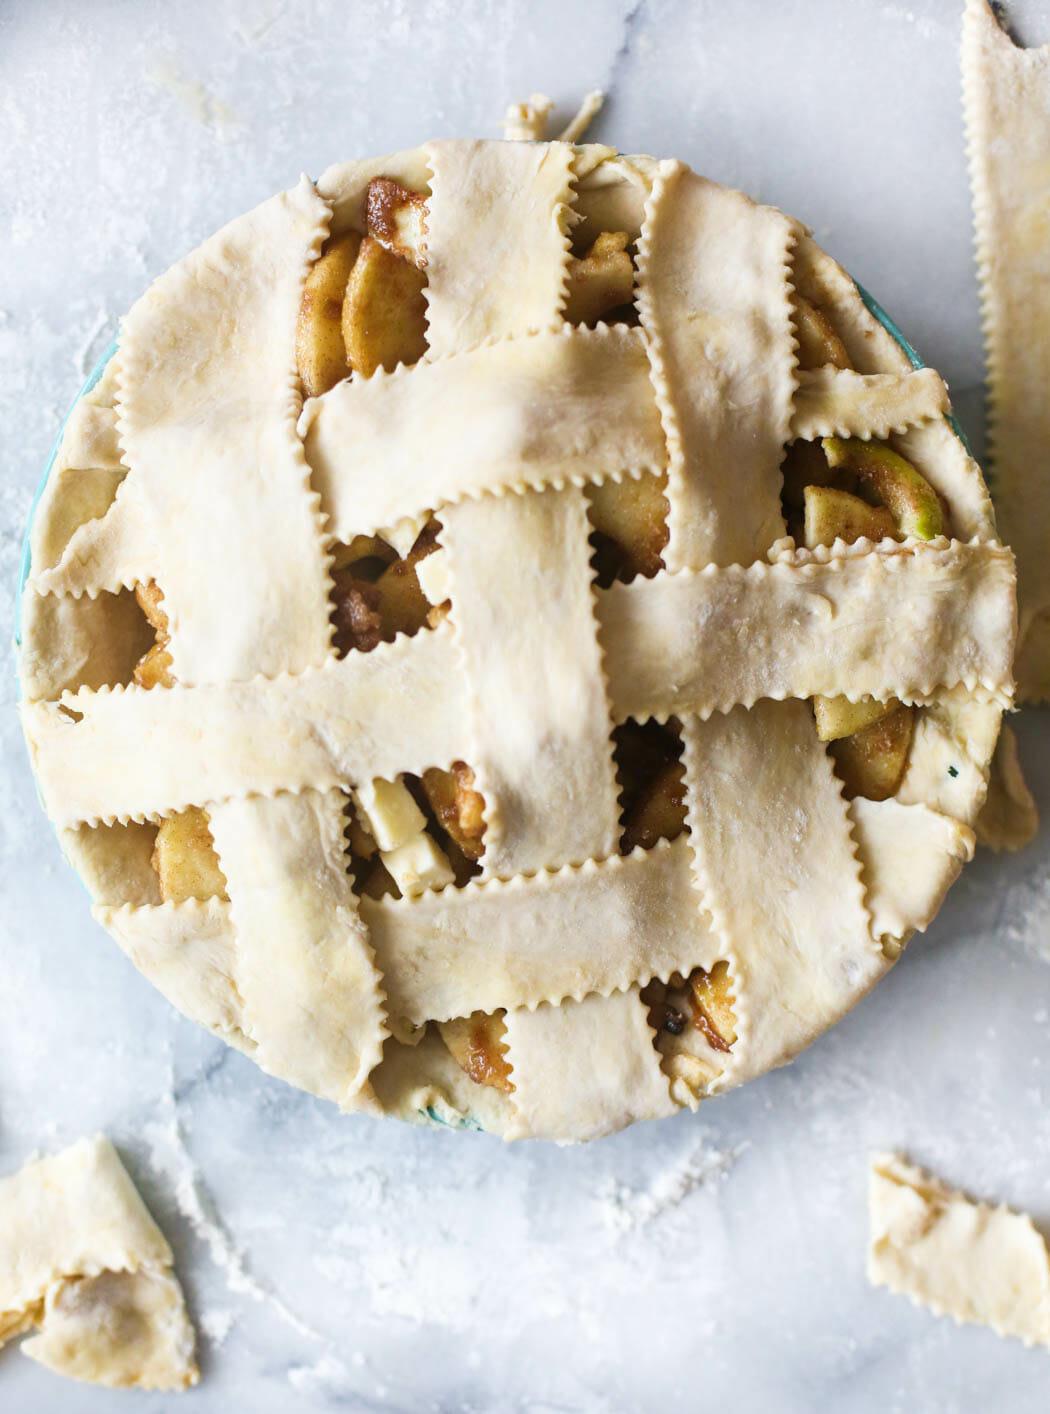 apple pie with lattice top crust before baking